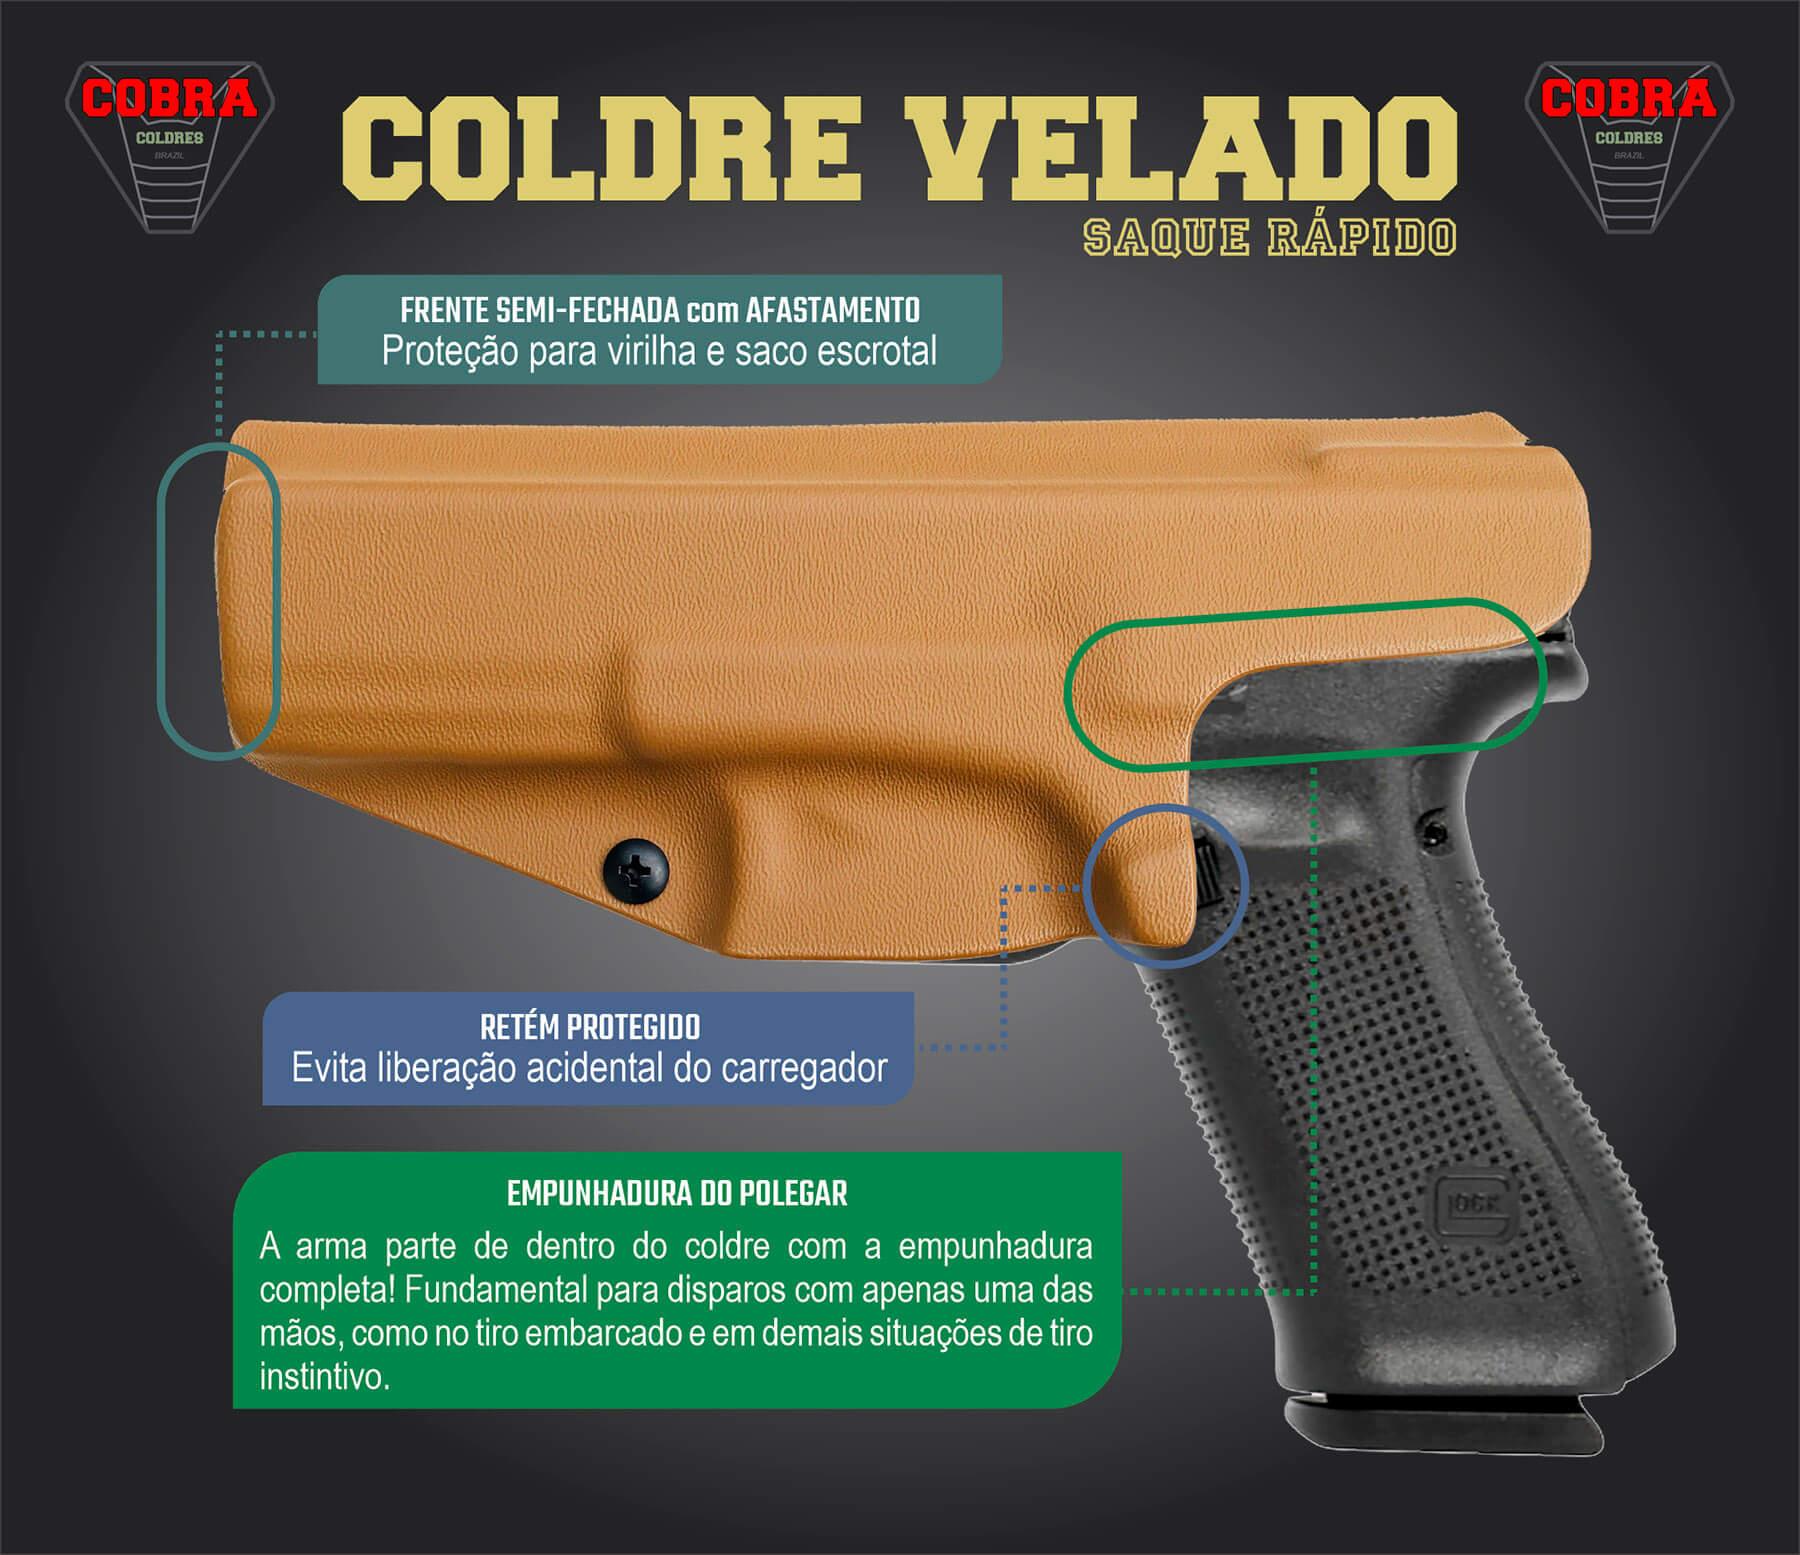 Coldre [TS9] [TS] Kydex® Taurus Striker - Slim - Saque Rápido Velado - Coyote